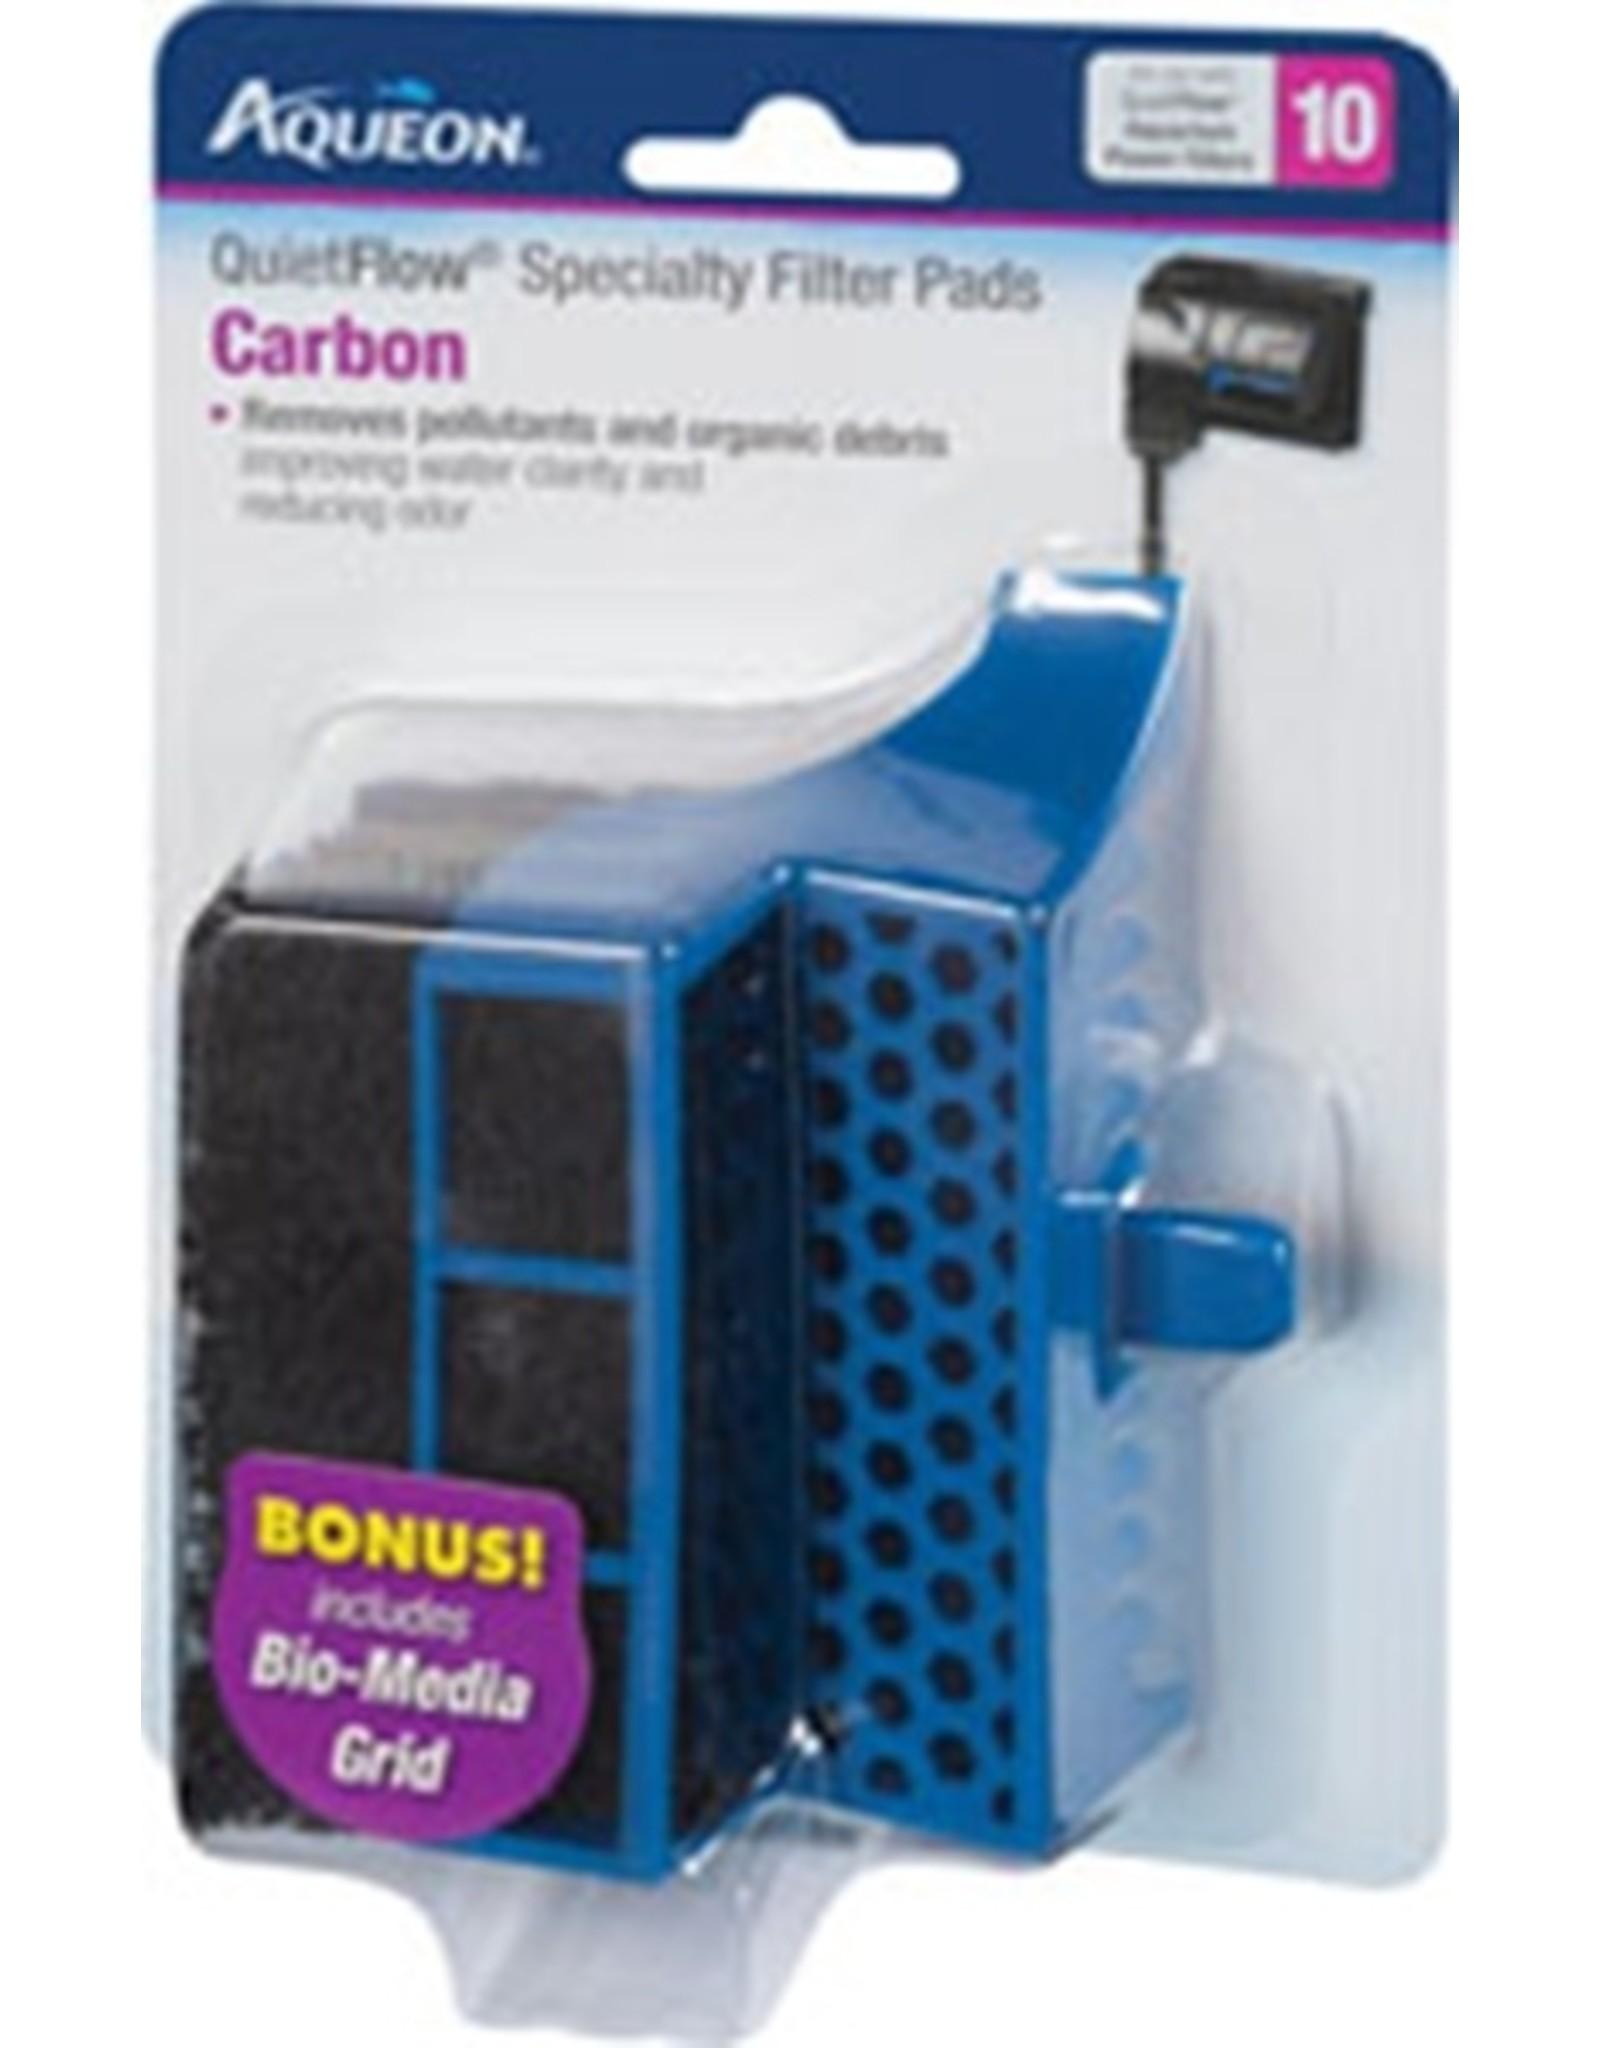 Aqueon AQUEON Specialty Filter Pad Carbon Cartridge w/ Biomedia grid Quietflow 10